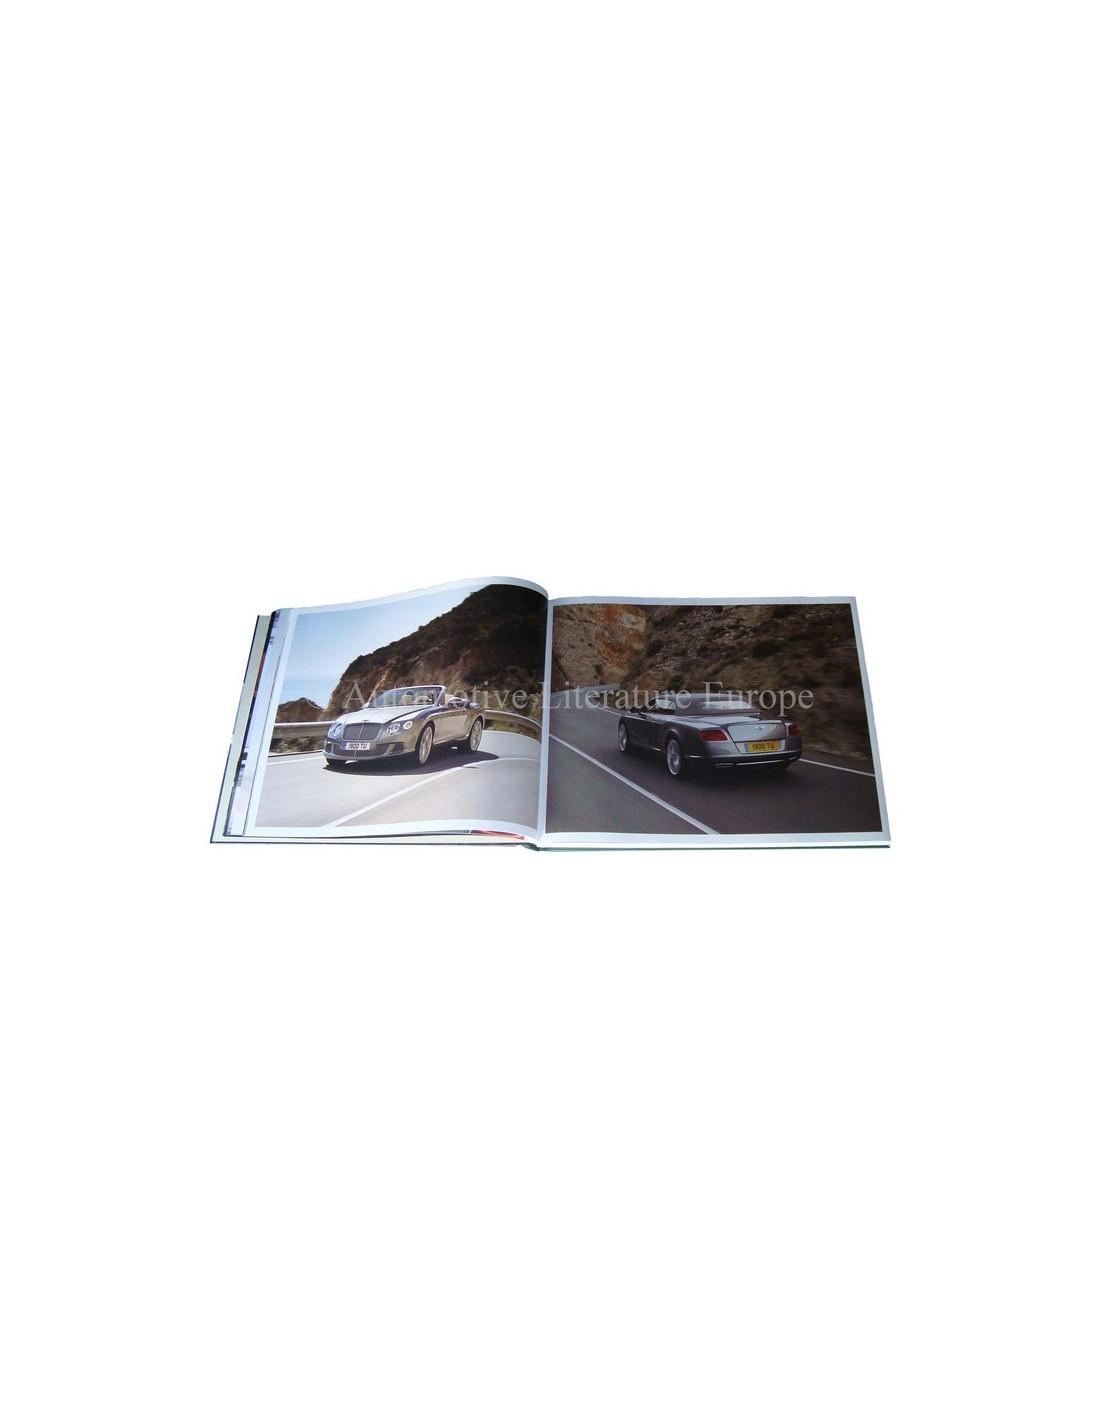 2019 Bentley Continental Gt W12 Convertible New Release: 2012 BENTLEY CONTINENTAL CONVERTIBLE GT W12 HARDBACK